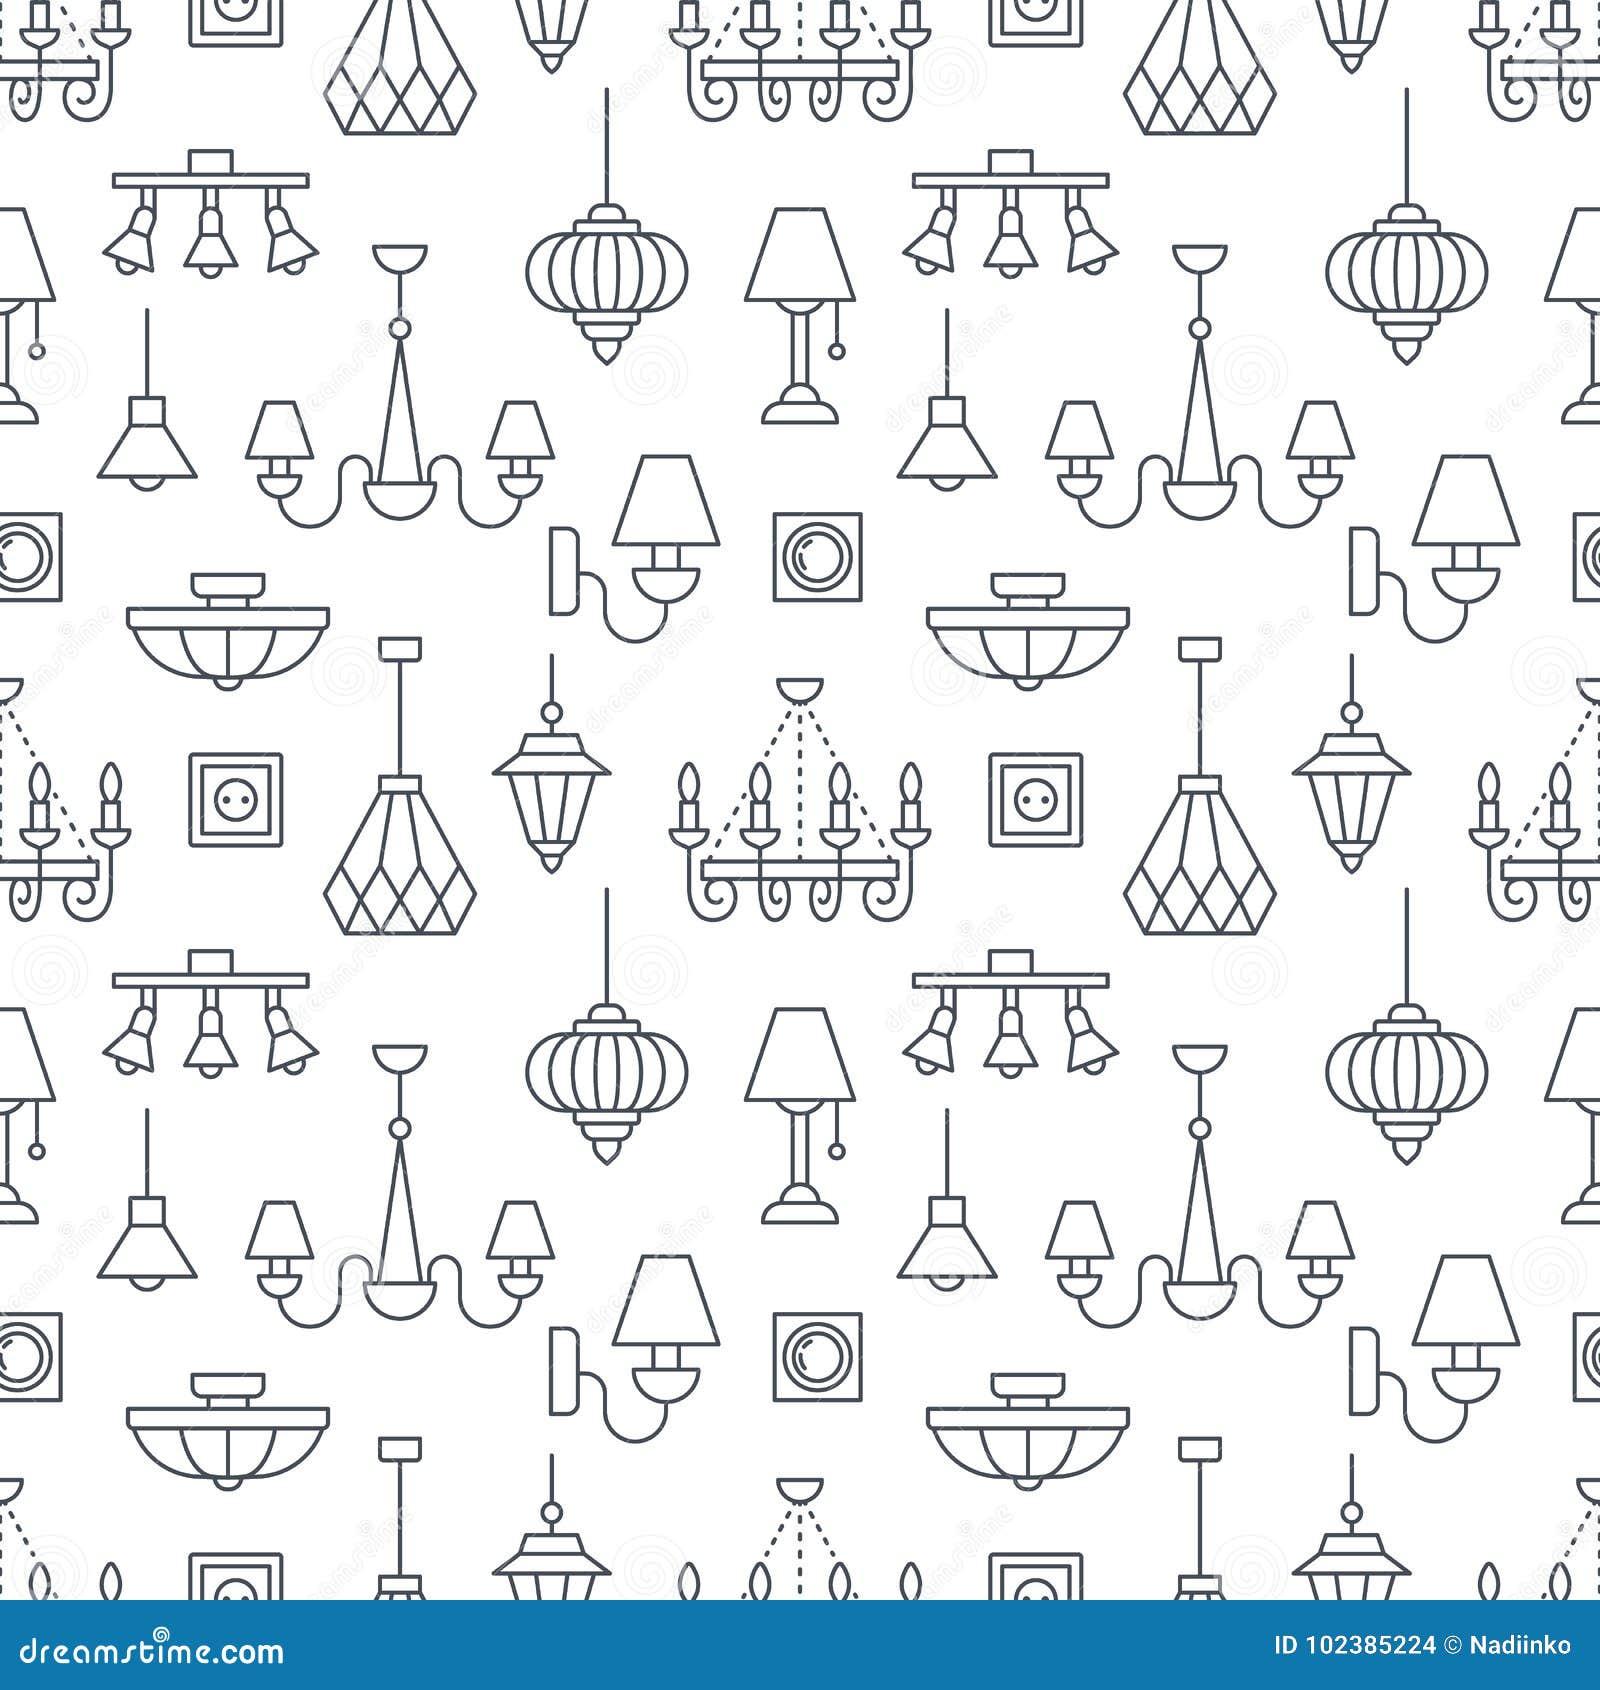 Light Fixture, Lamps Seamless Pattern, Line Illustration